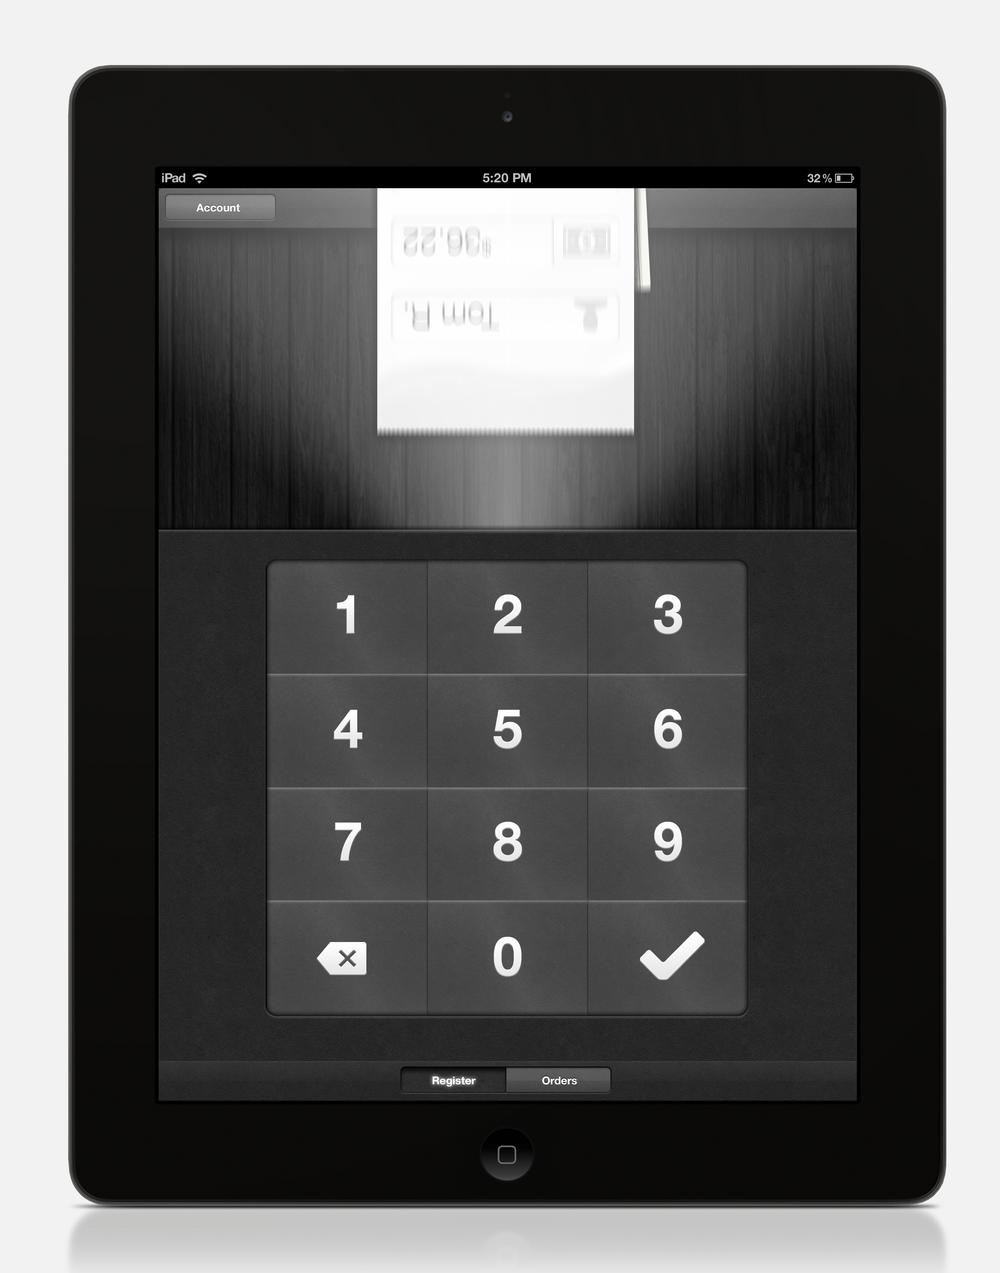 merchant-iPad-payment.png